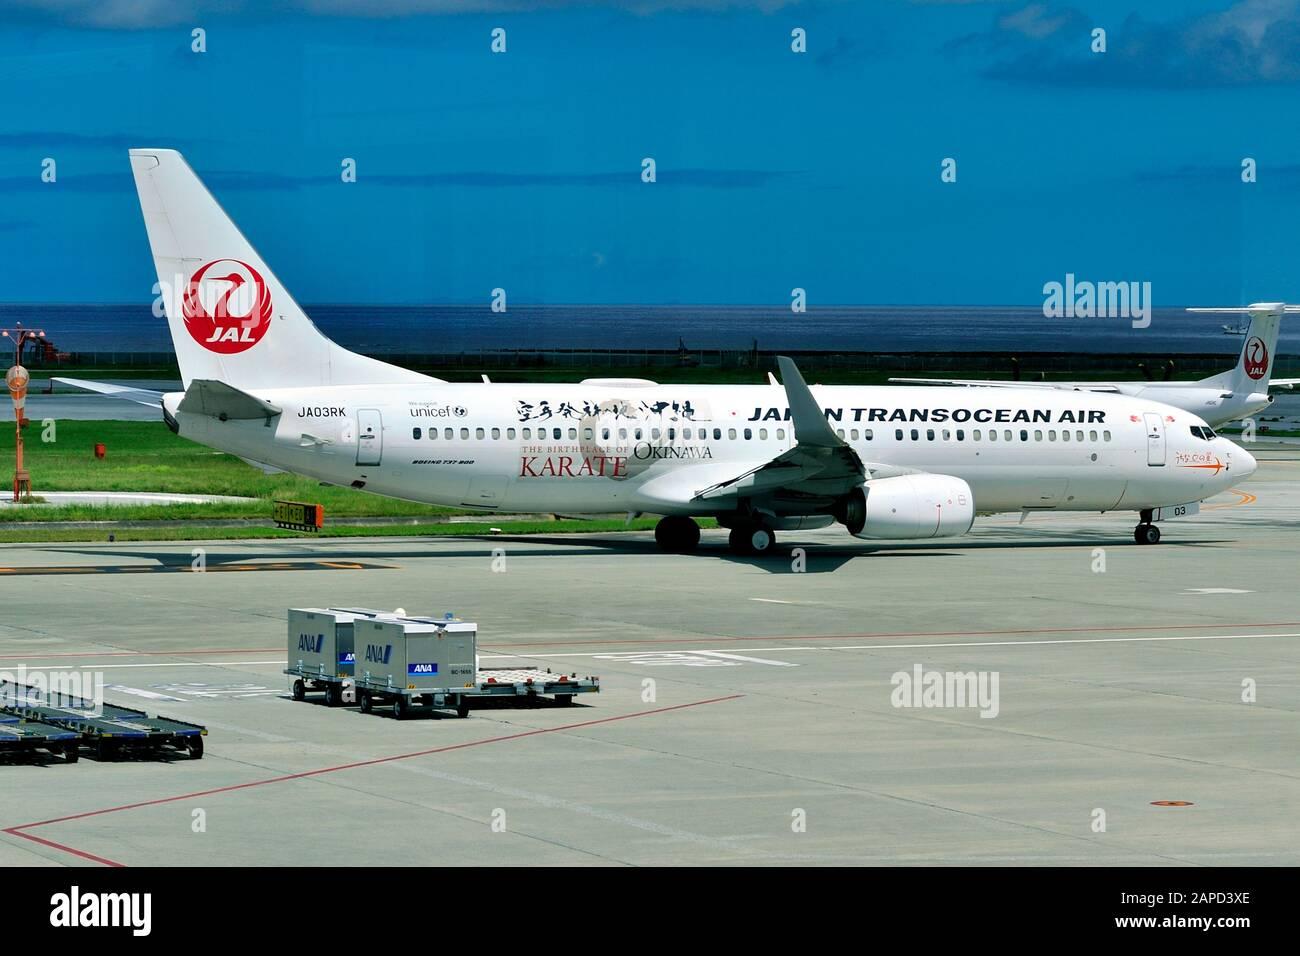 Japan Transocean Air, JTA, Boeing, B-737/800, JA03RK, Karate Livery, Taxi to TO, Naha Airport, Naha, Okinawa, Ryukyu Islands, Japan Stock Photo